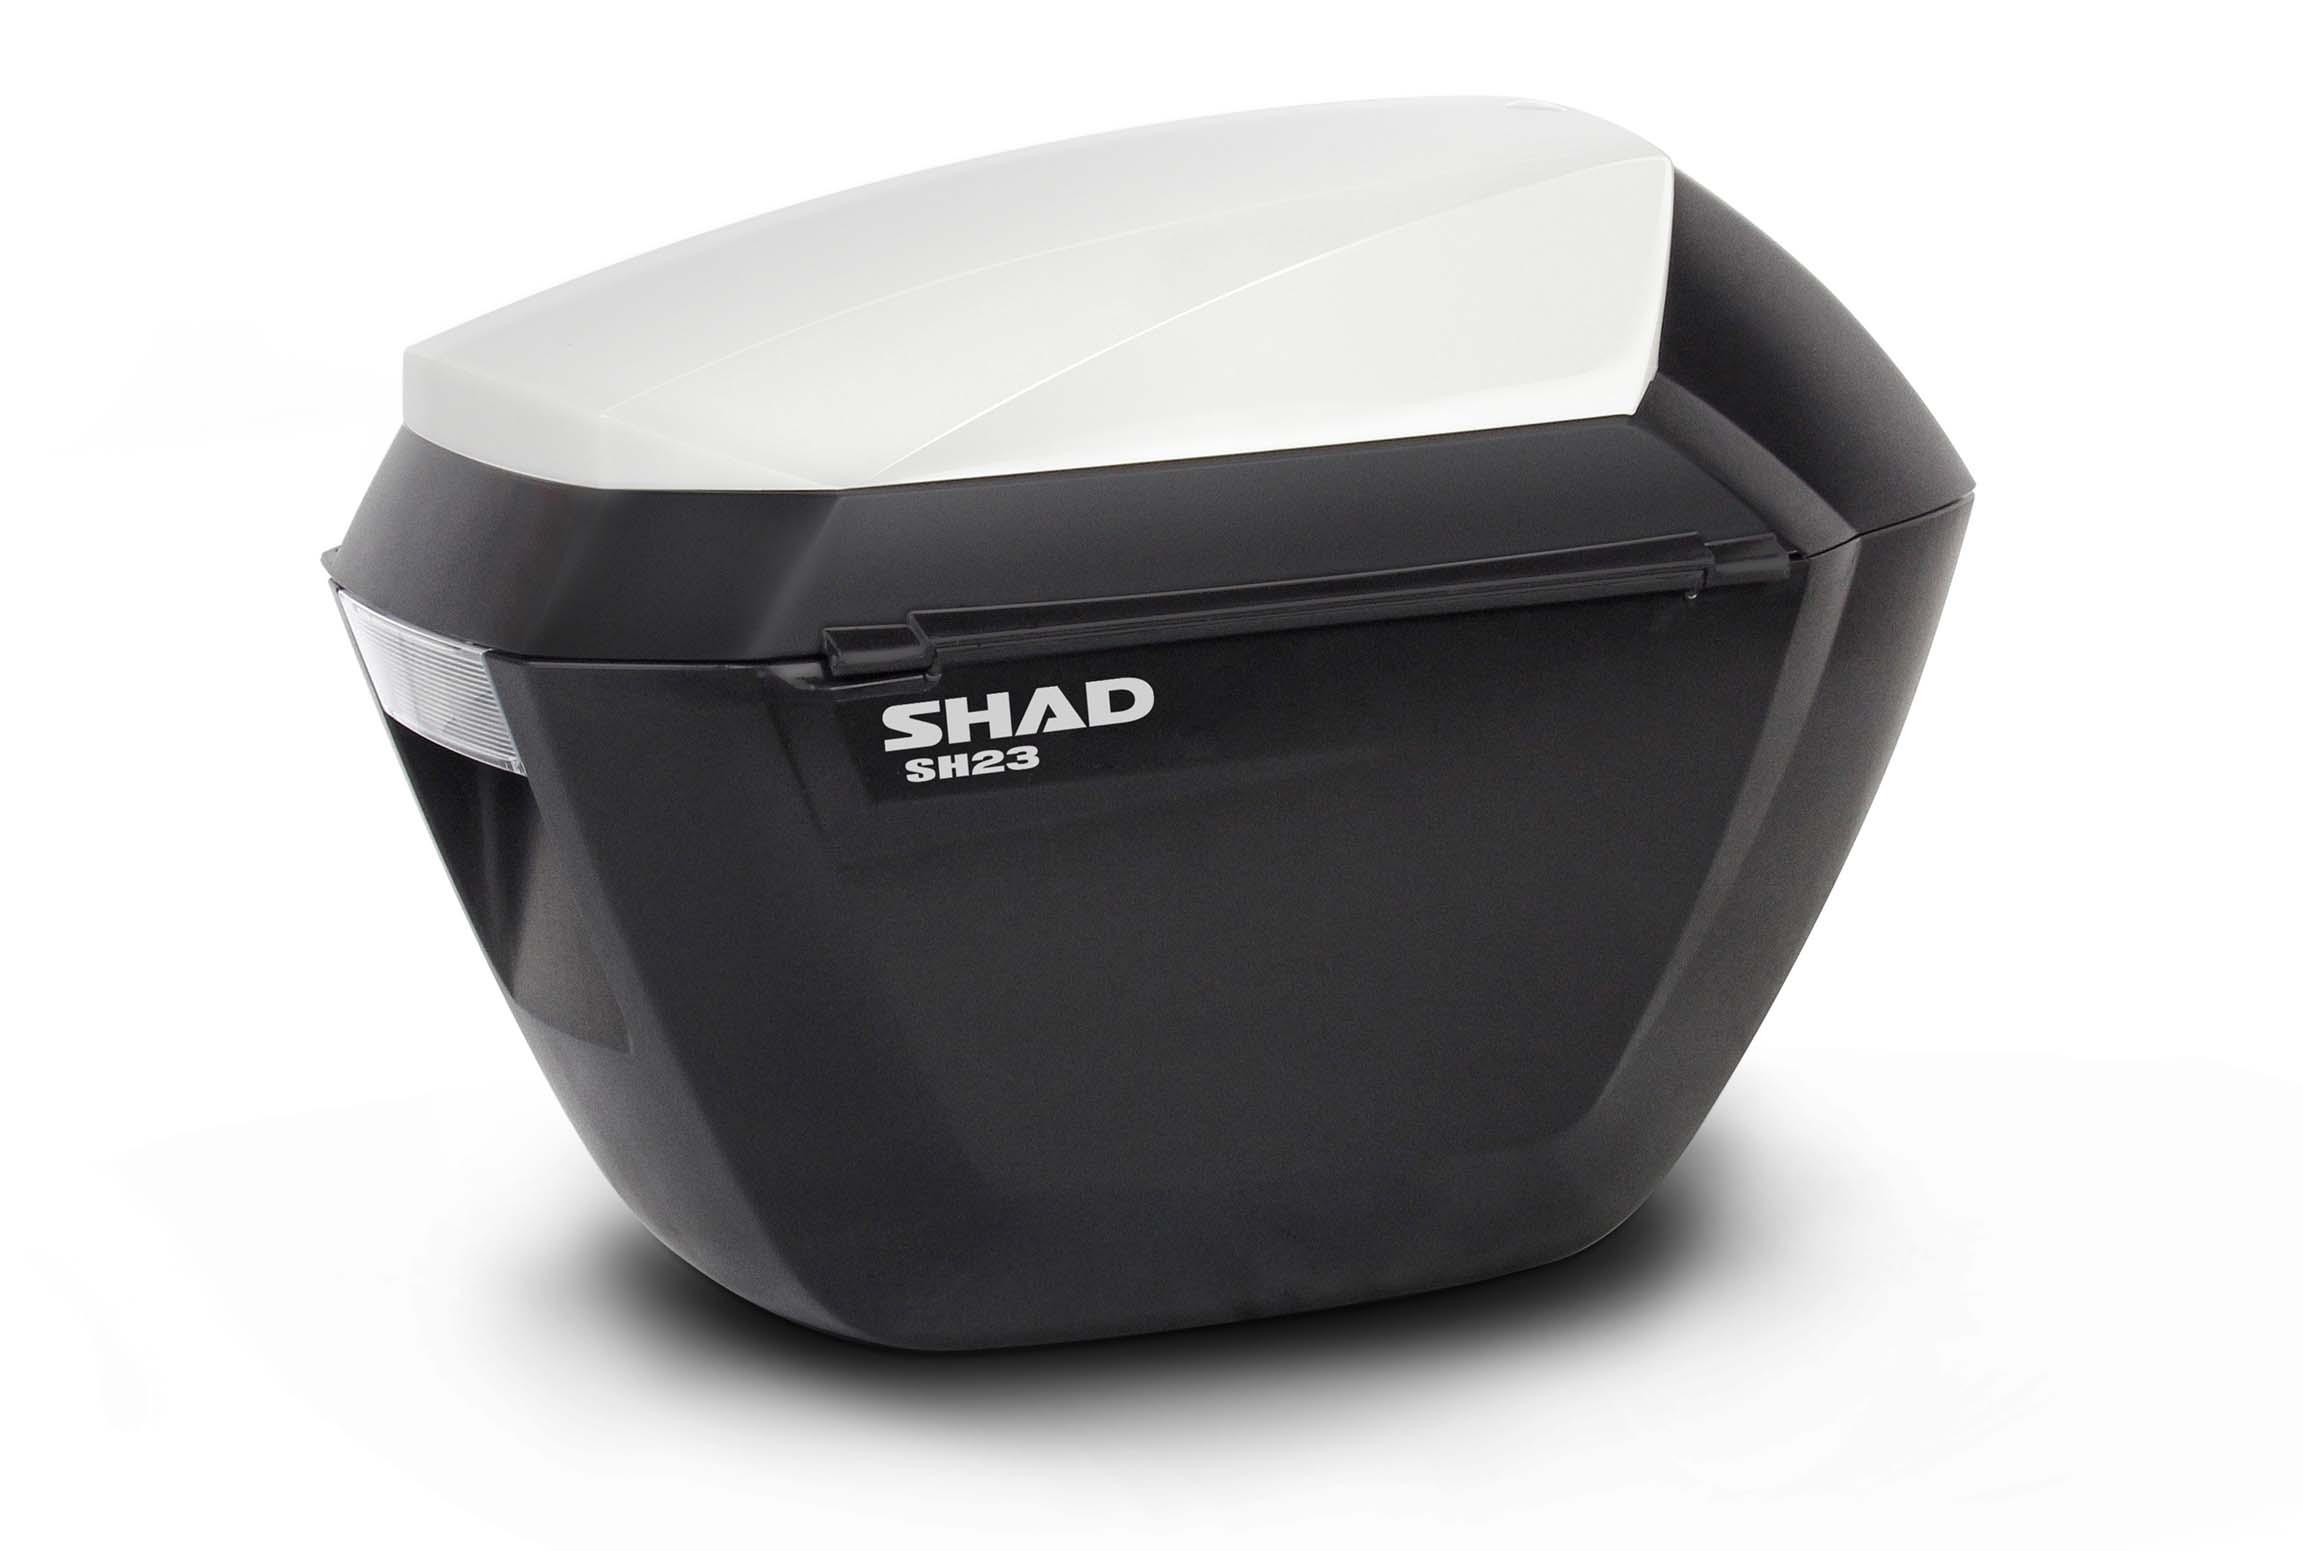 shad  sh23